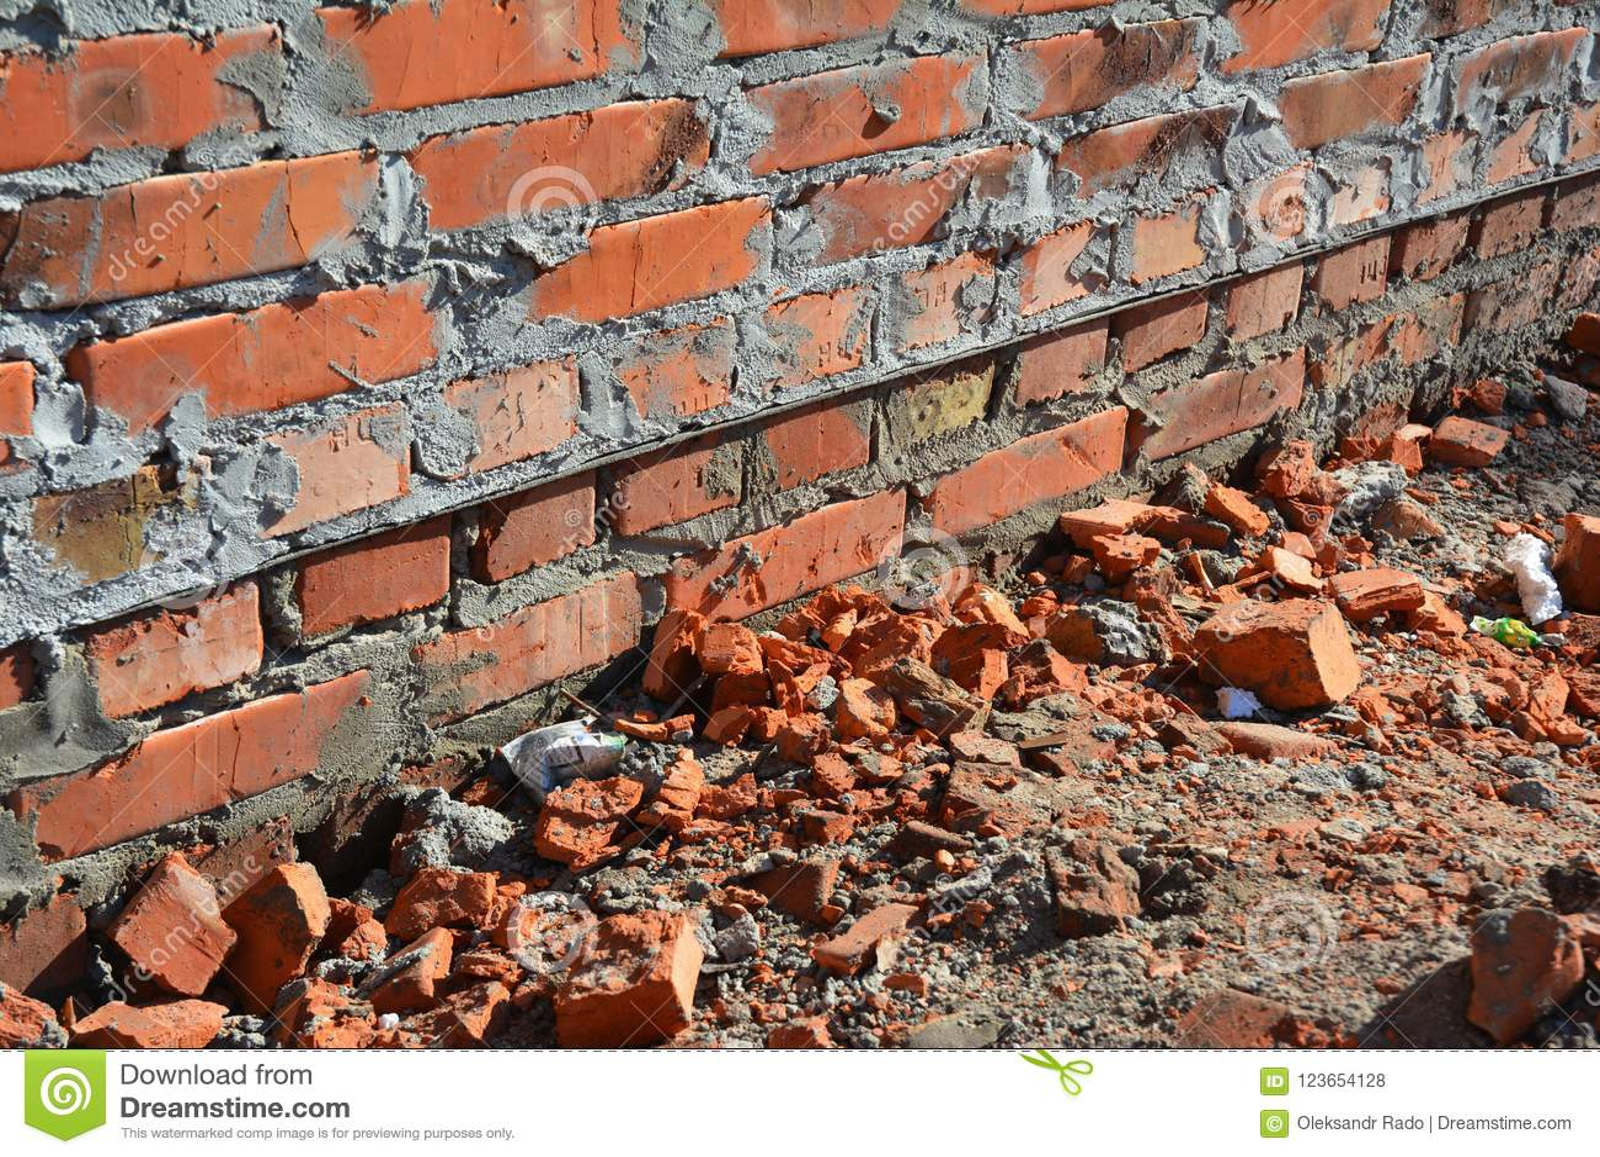 Close Up On Bitumen Waterproofing Membrane On Brick House Wall Foundation Stock Photo Image Of Wetness Bricks 123654128